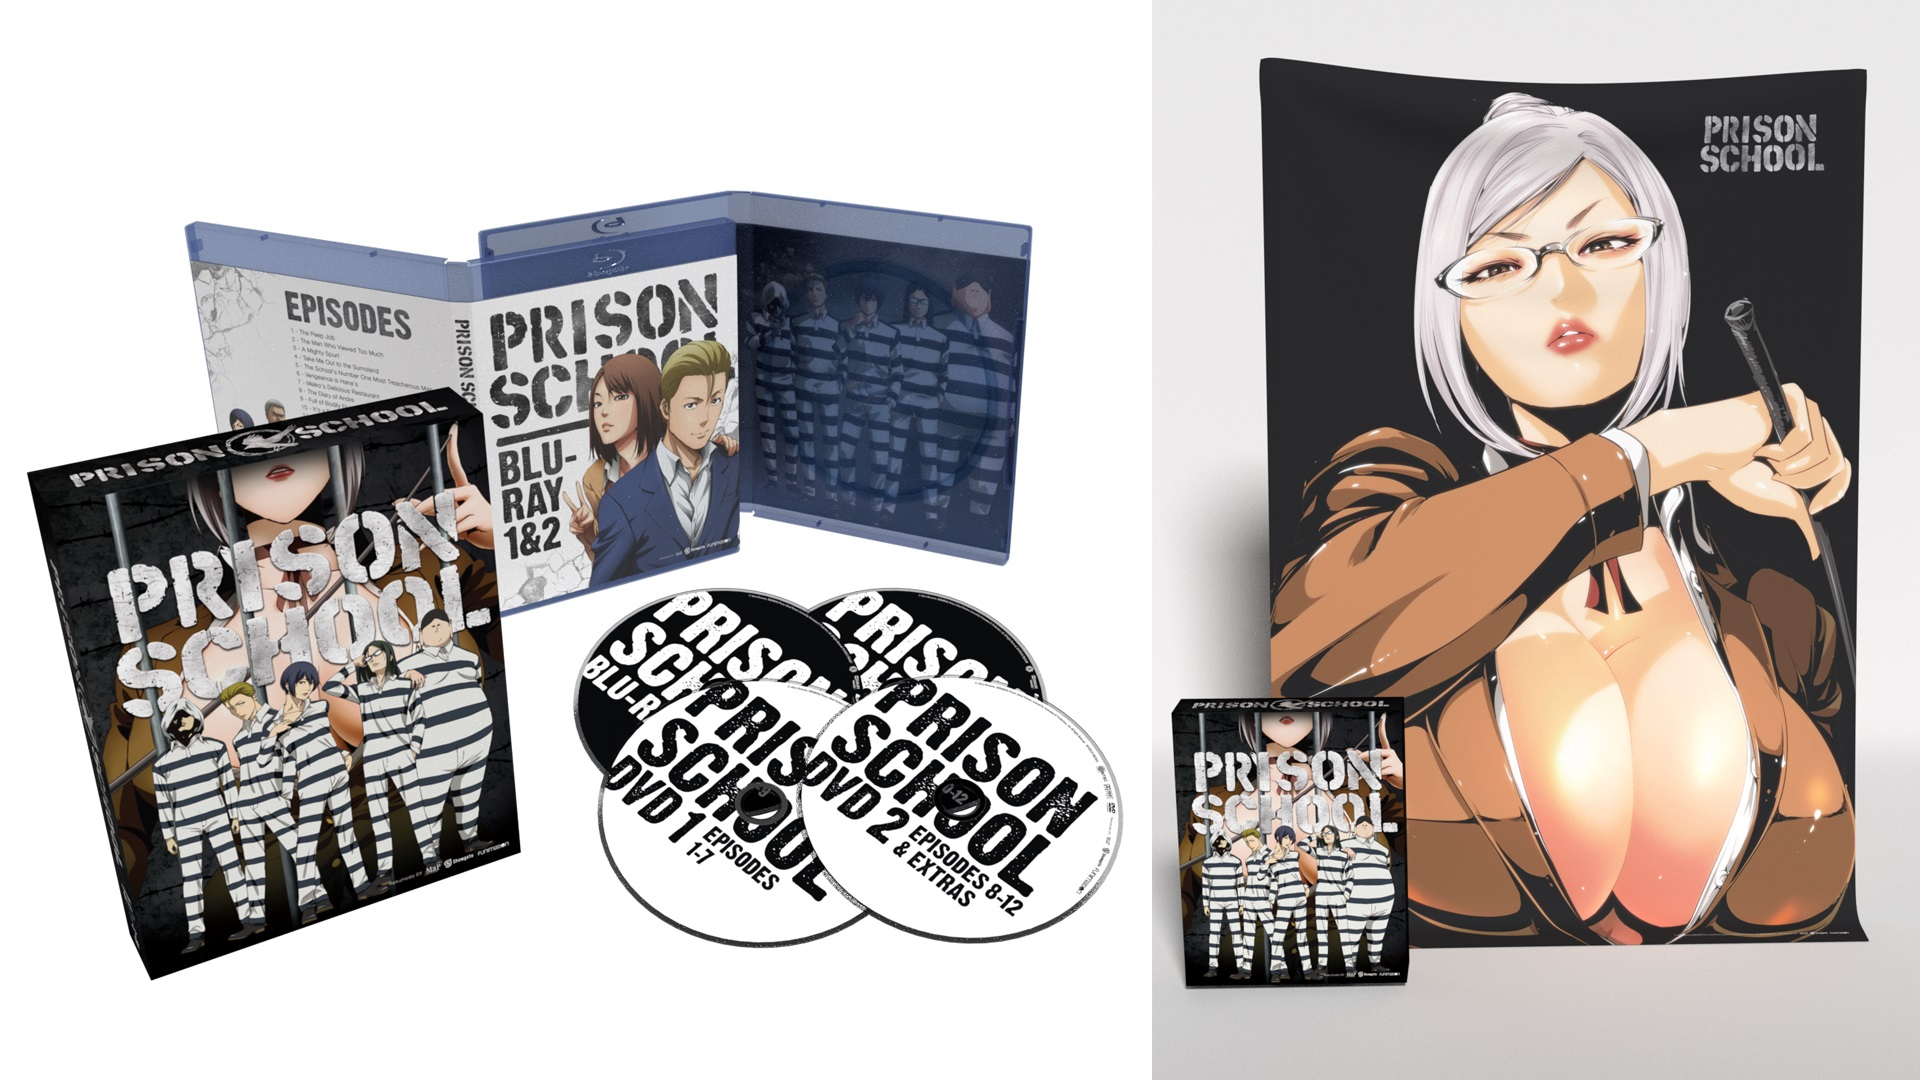 Prison School Limited Edition Blu-ray/DVD